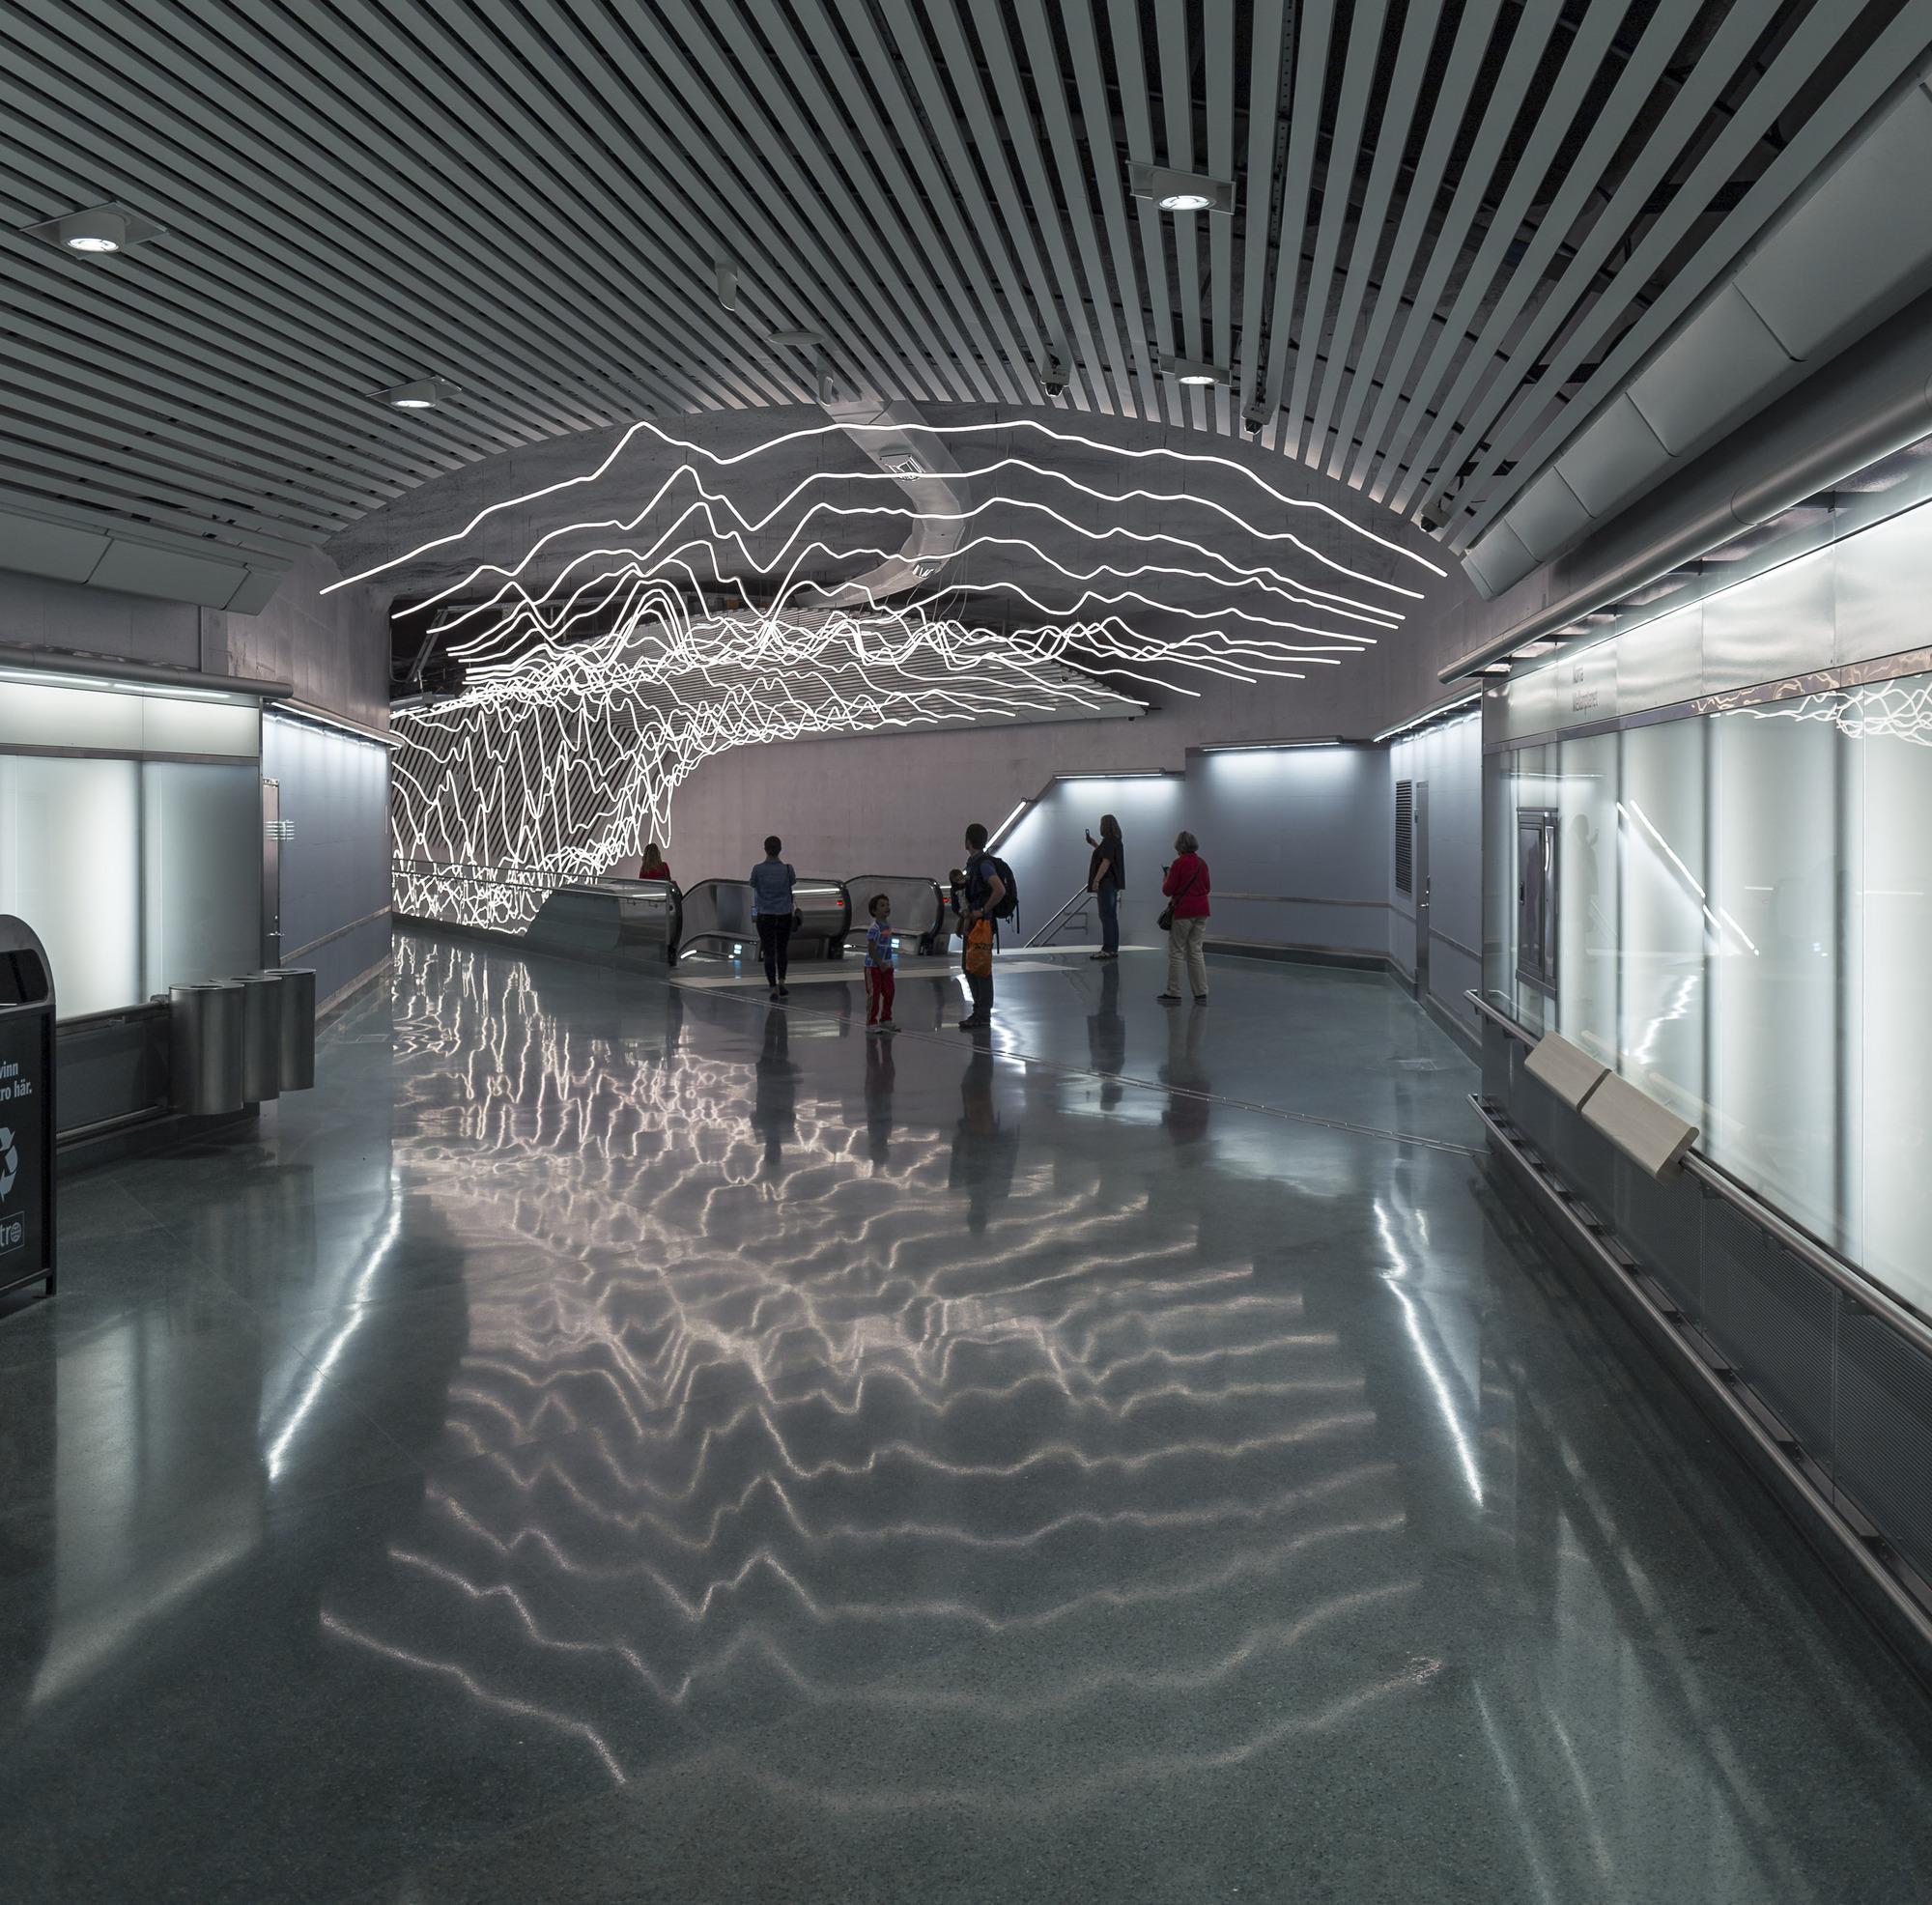 Galer a de una instalaci n de iluminaci n led suspendida - Arquitectos de interiores famosos ...